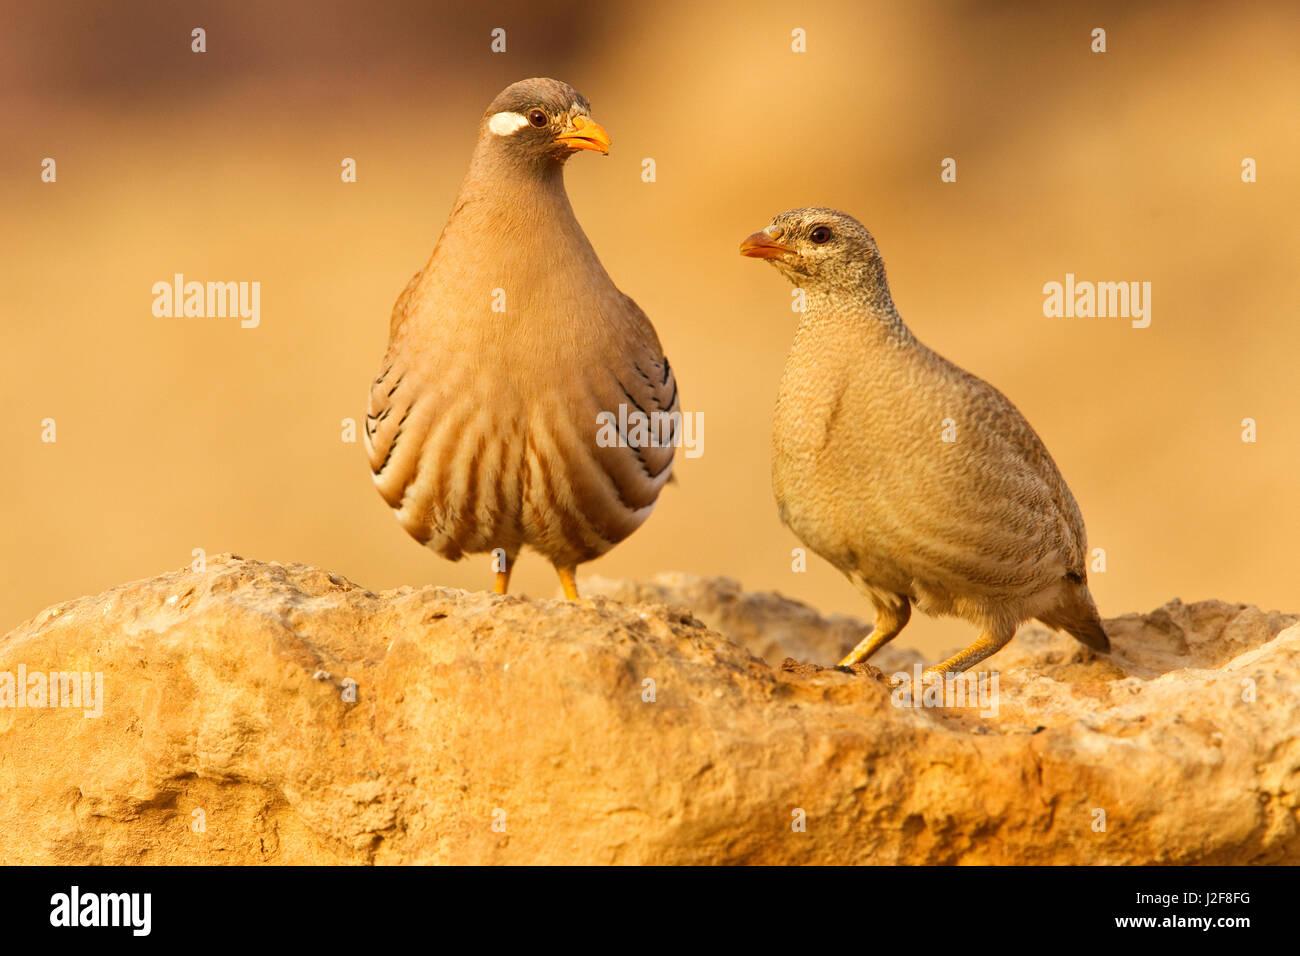 Pair Sand Partridges - Stock Image